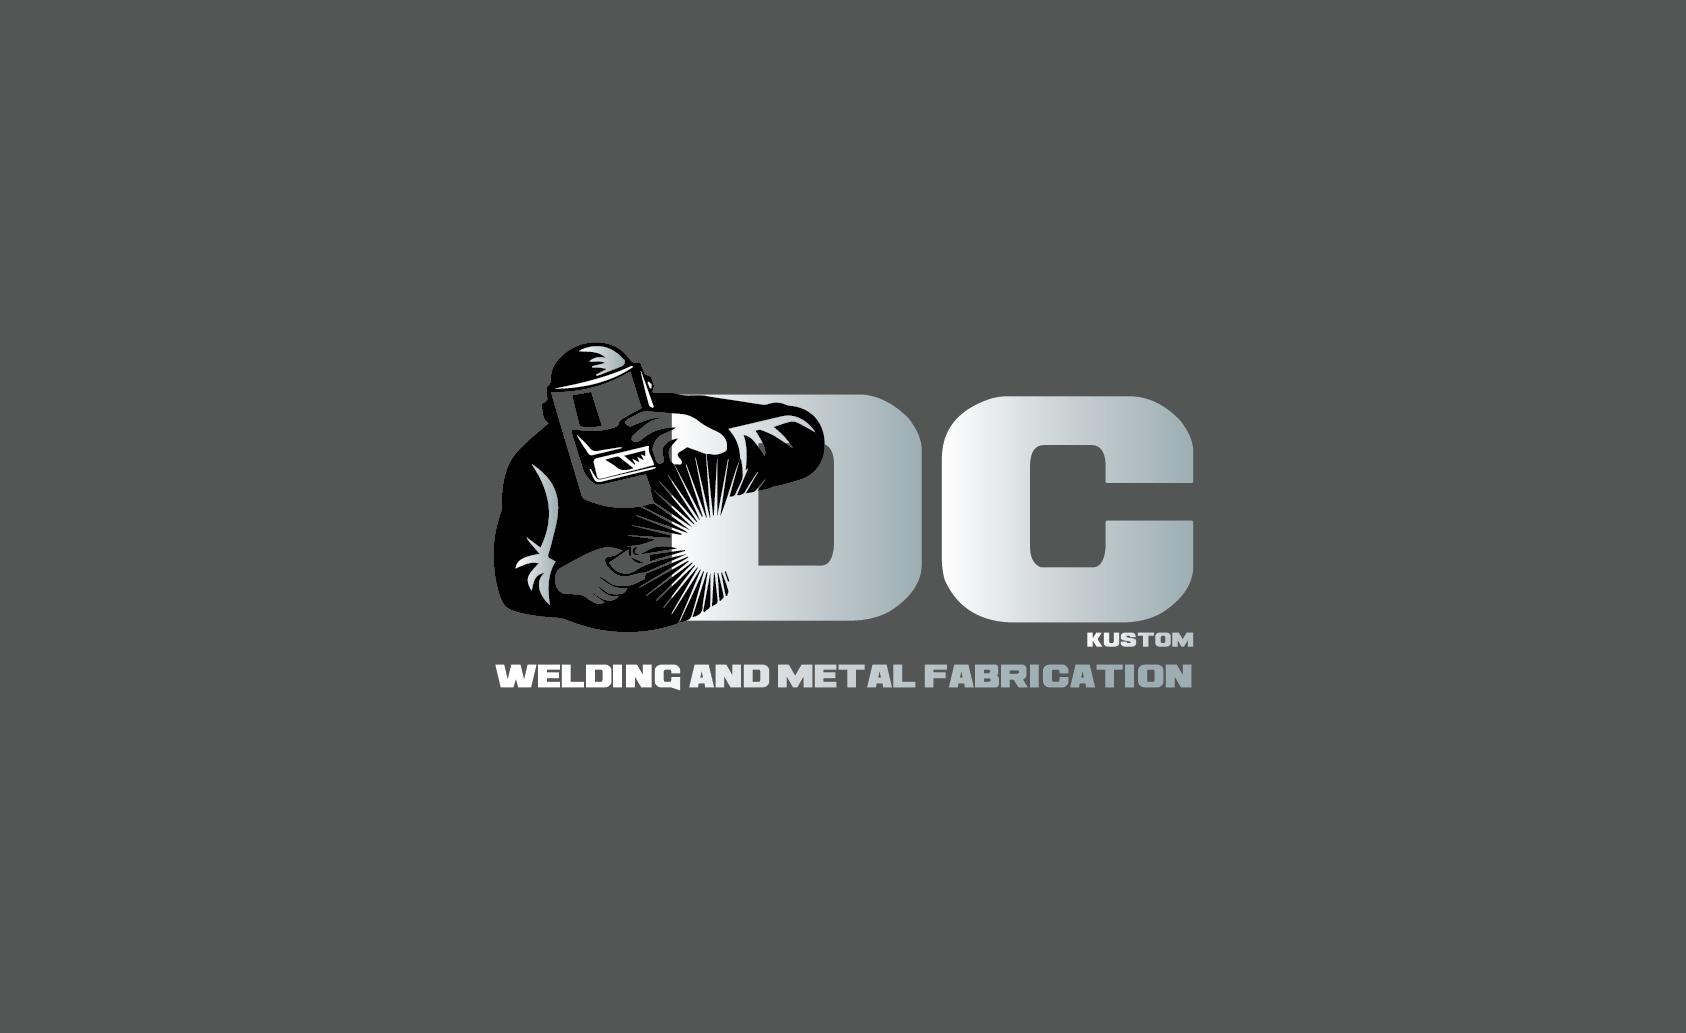 Logo Design by pojas12 - Entry No. 78 in the Logo Design Contest Imaginative Logo Design for DC KUSTOM WELDING & METAL FABRICATION.